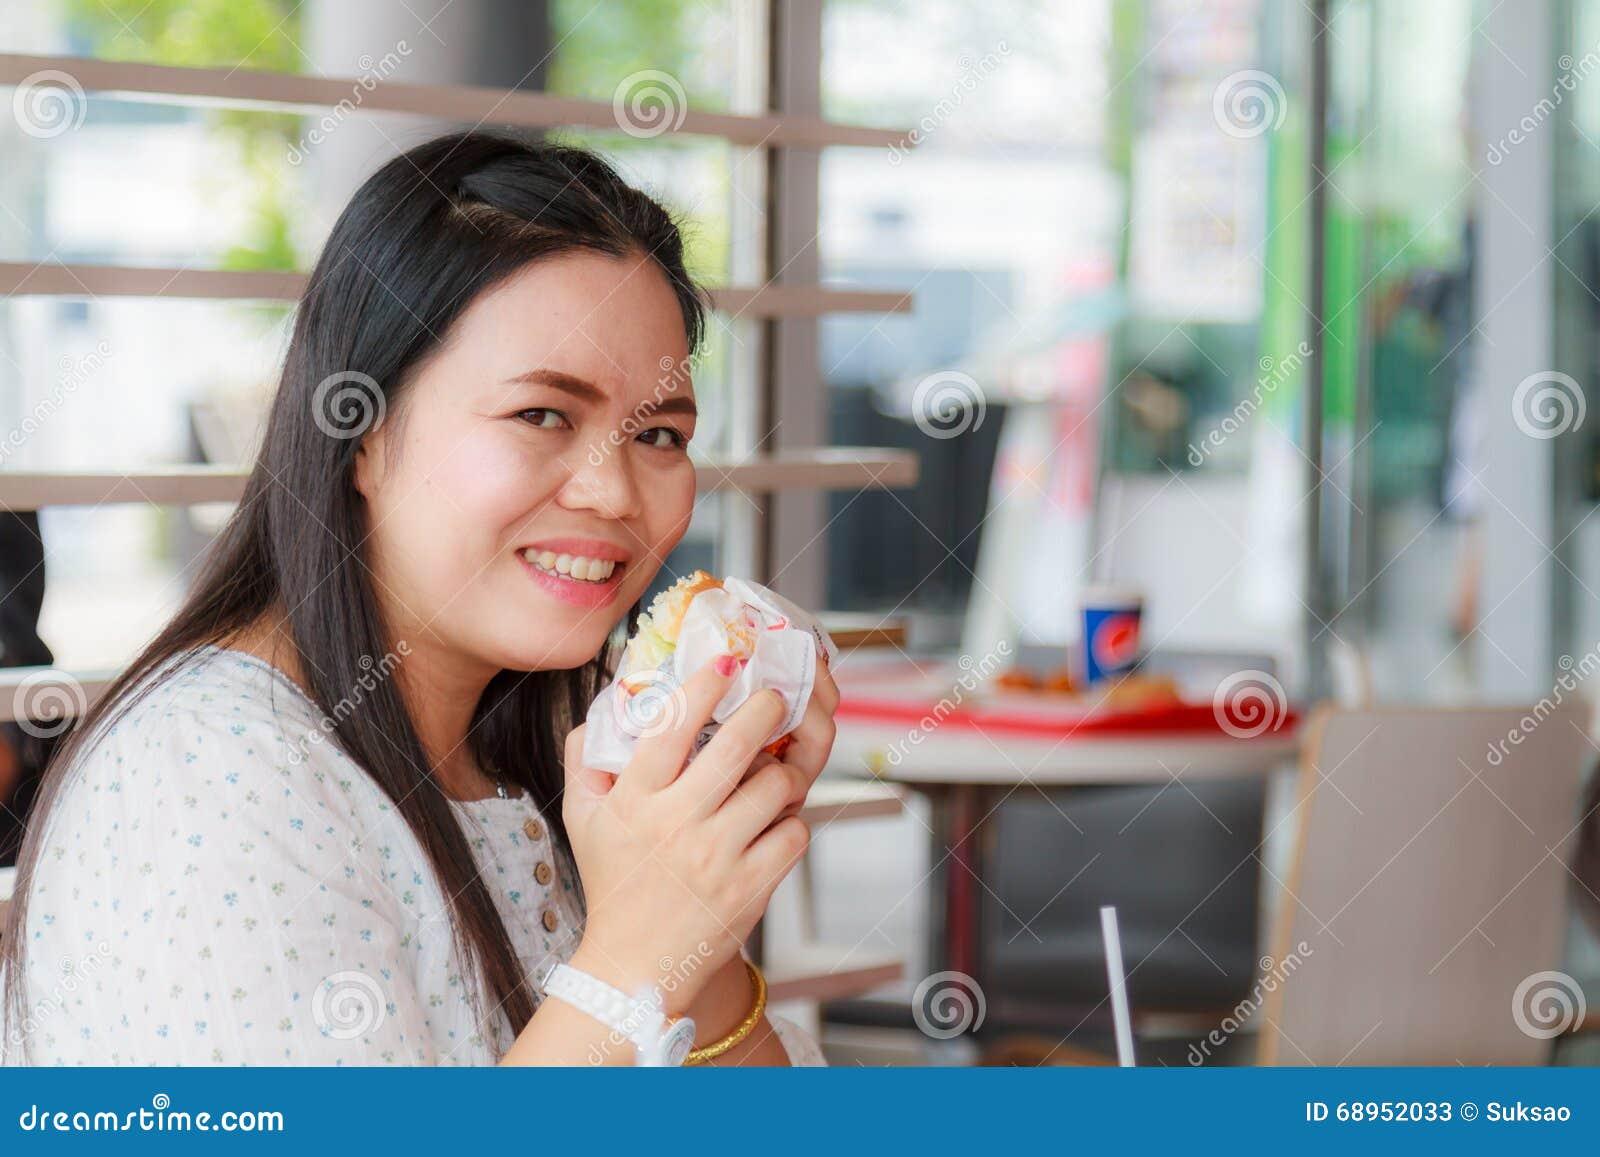 Girl Eat Hamburger